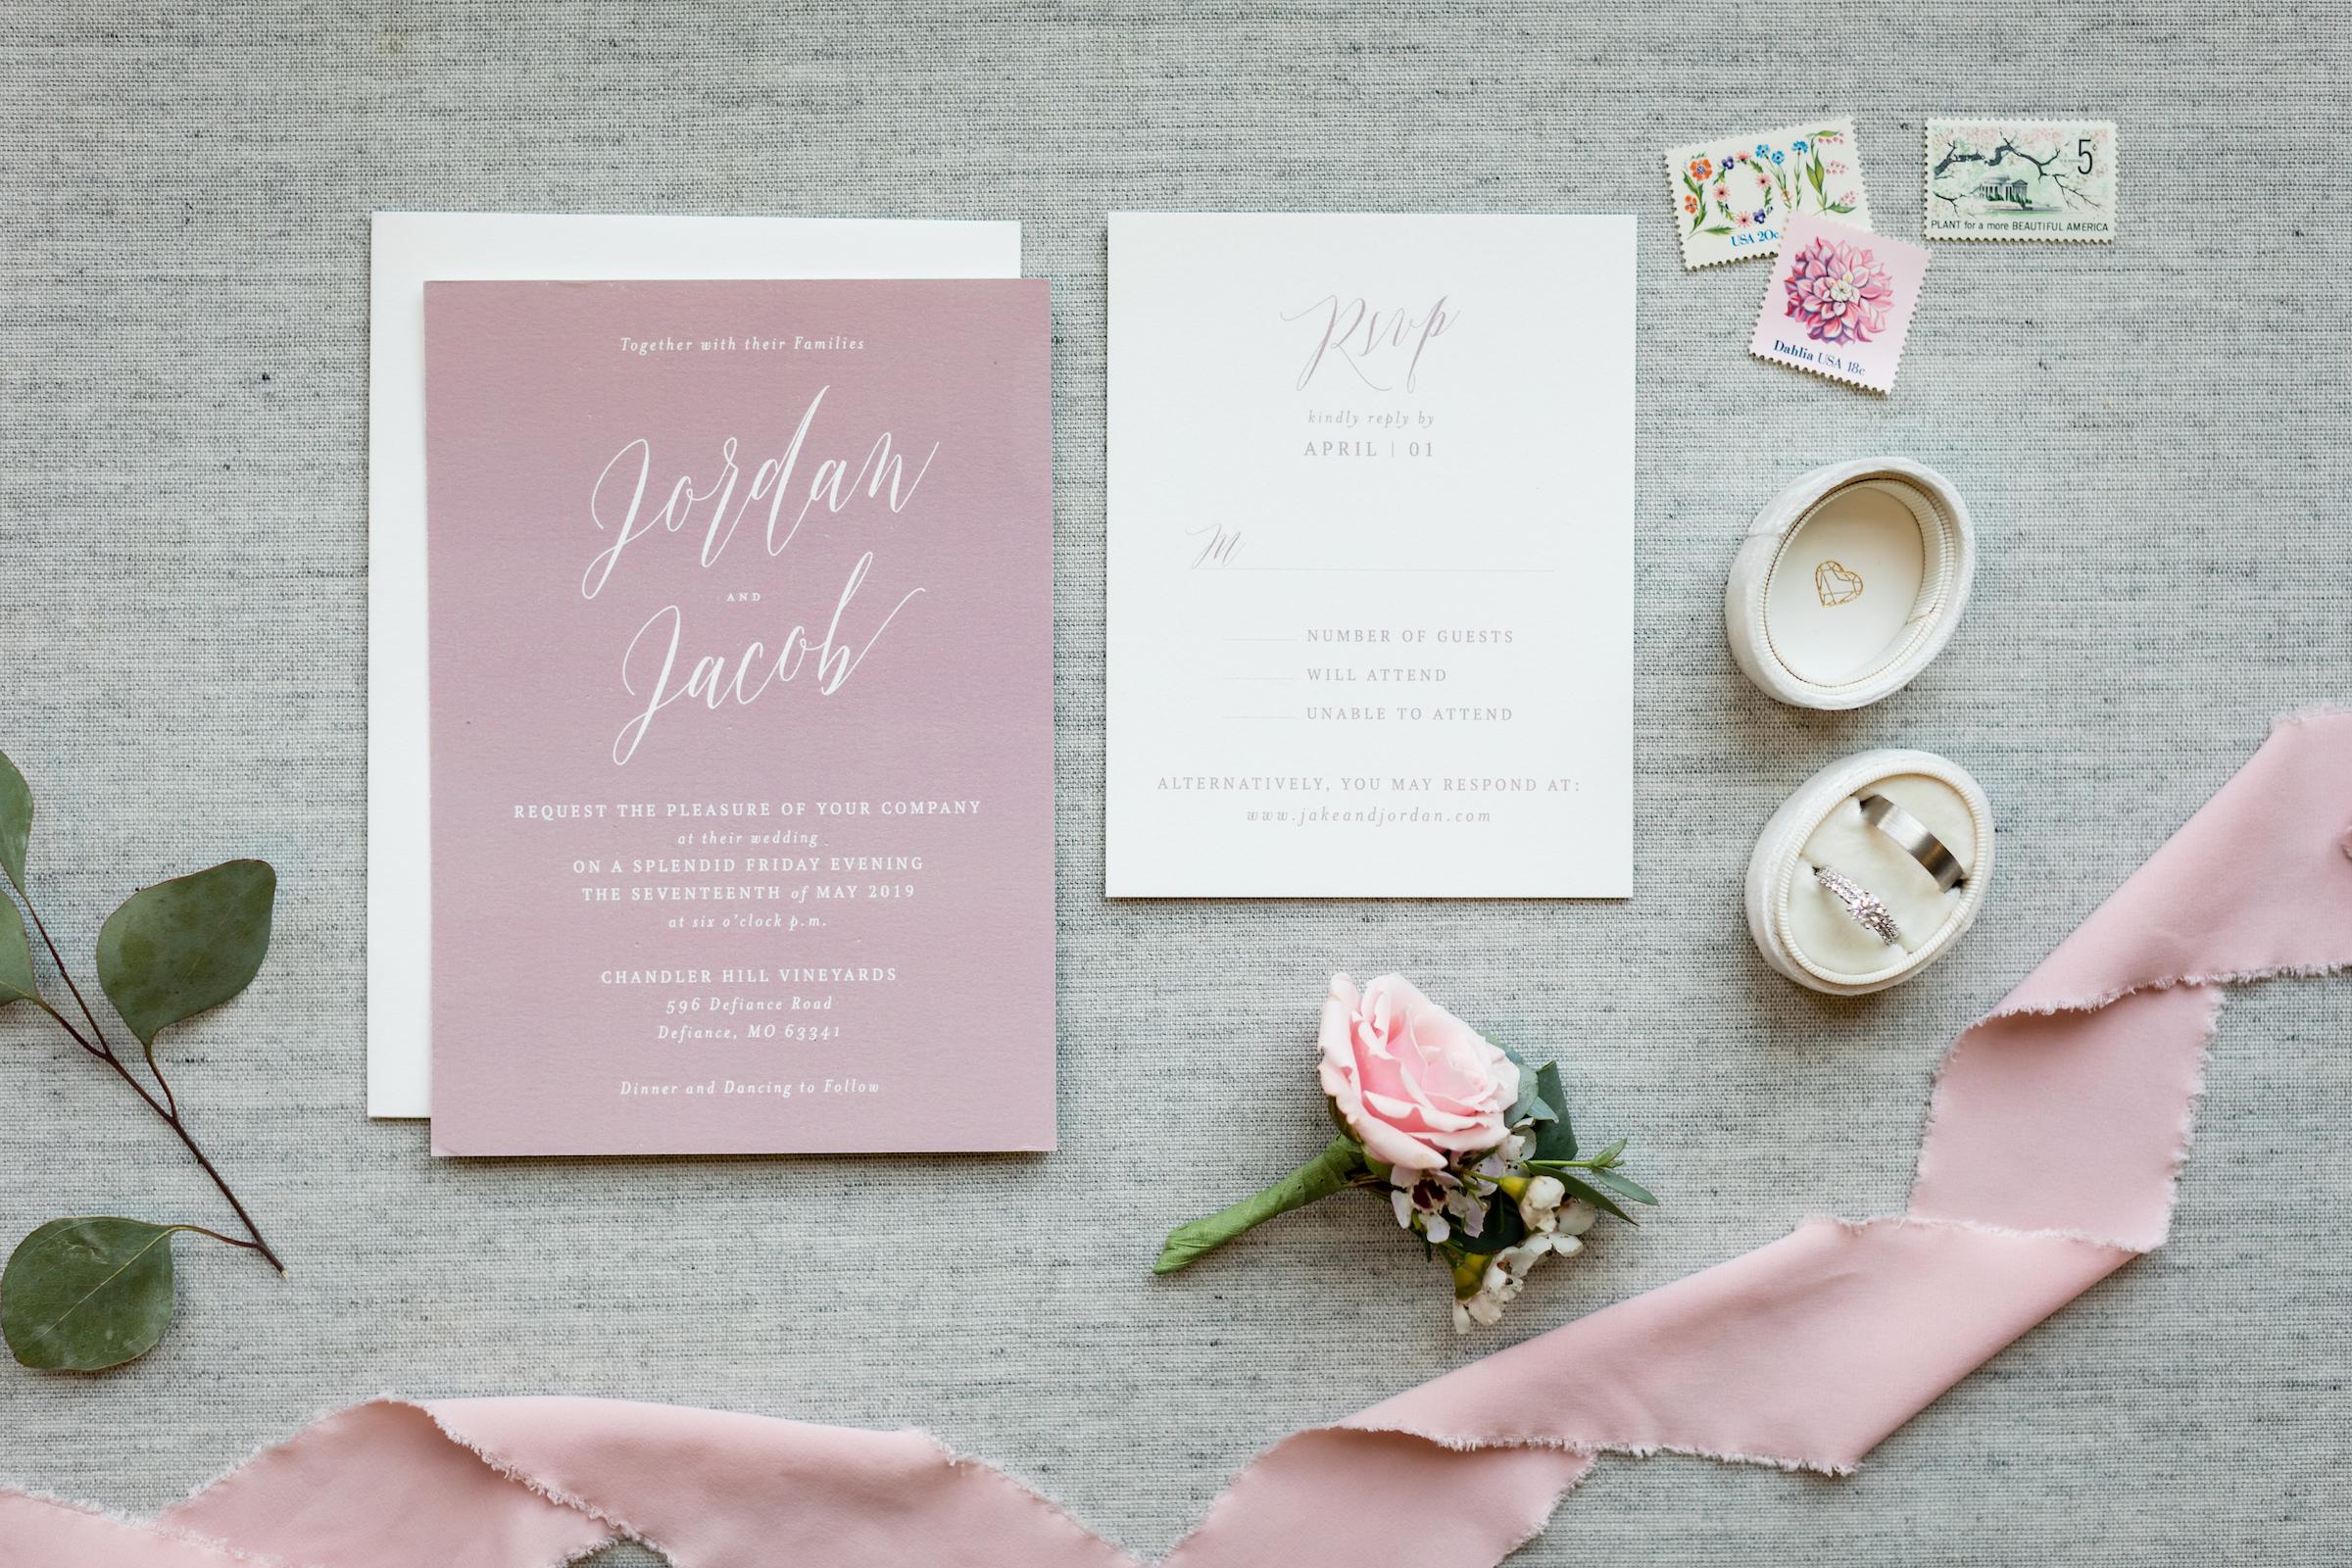 brielle-davis-events-kairos-photography-chandler-hill-wedding-invitation.jpg